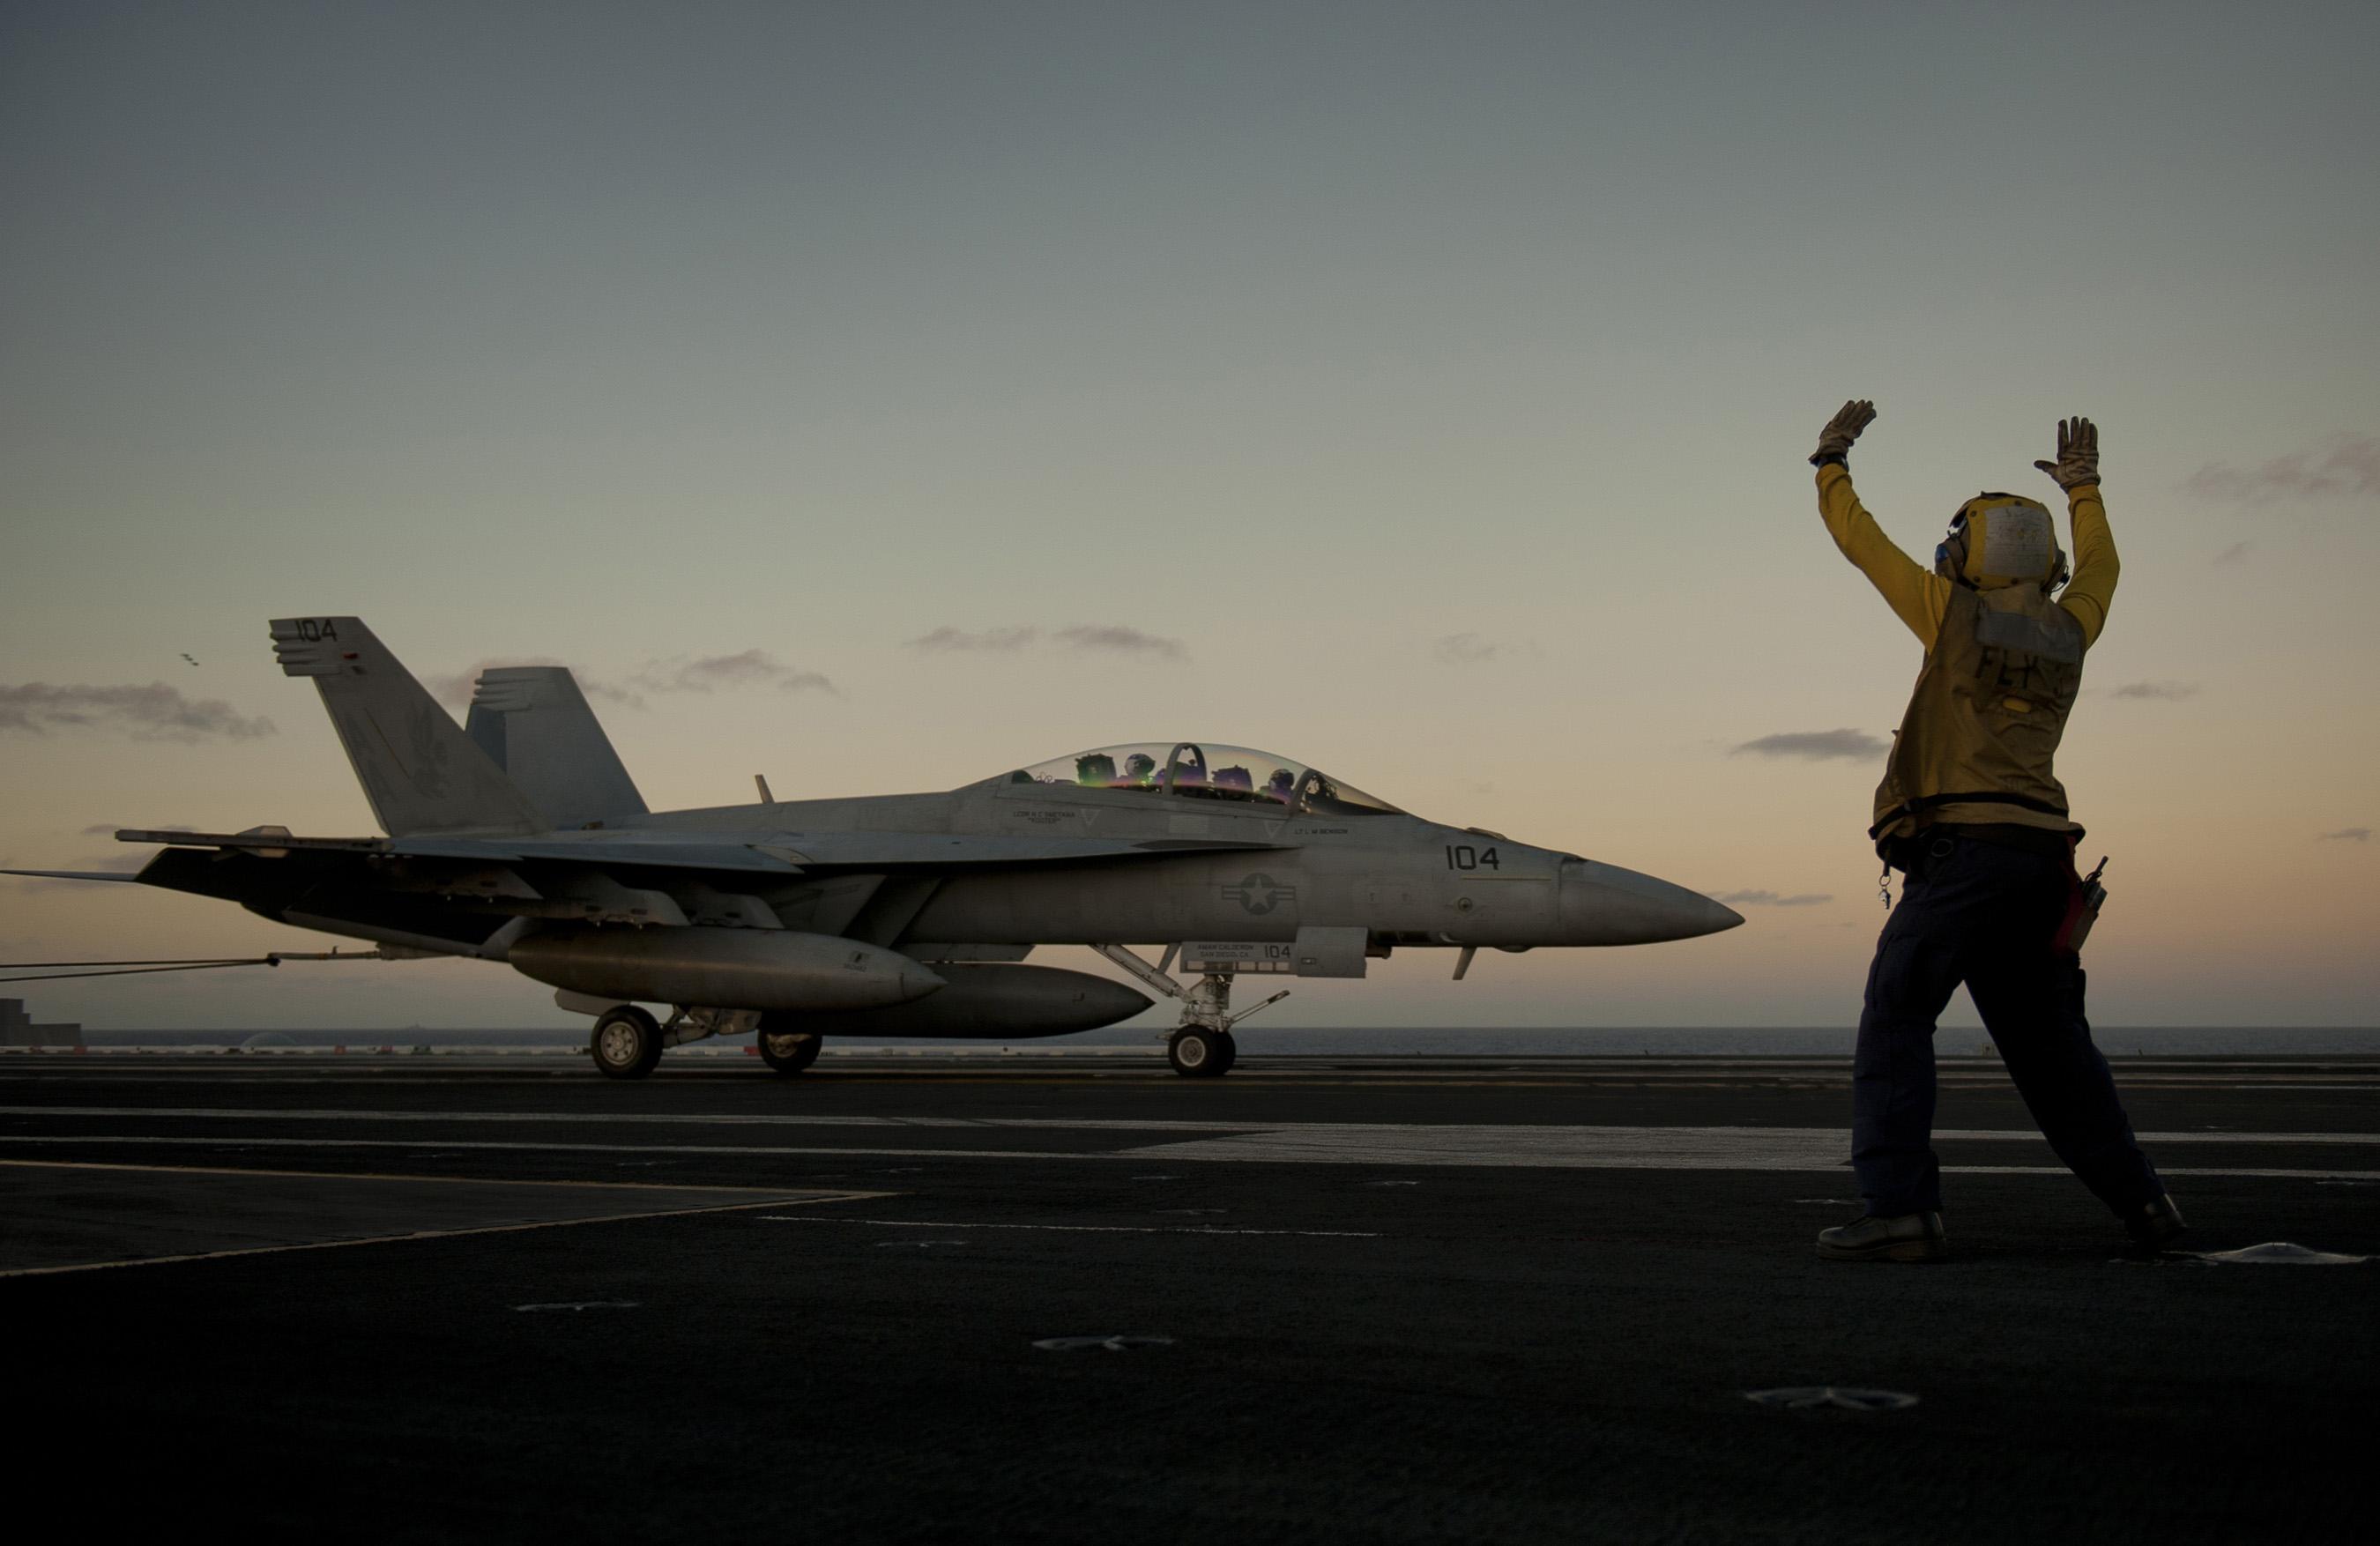 US_Navy_111217-N-DR144-187_Aviation_Boat